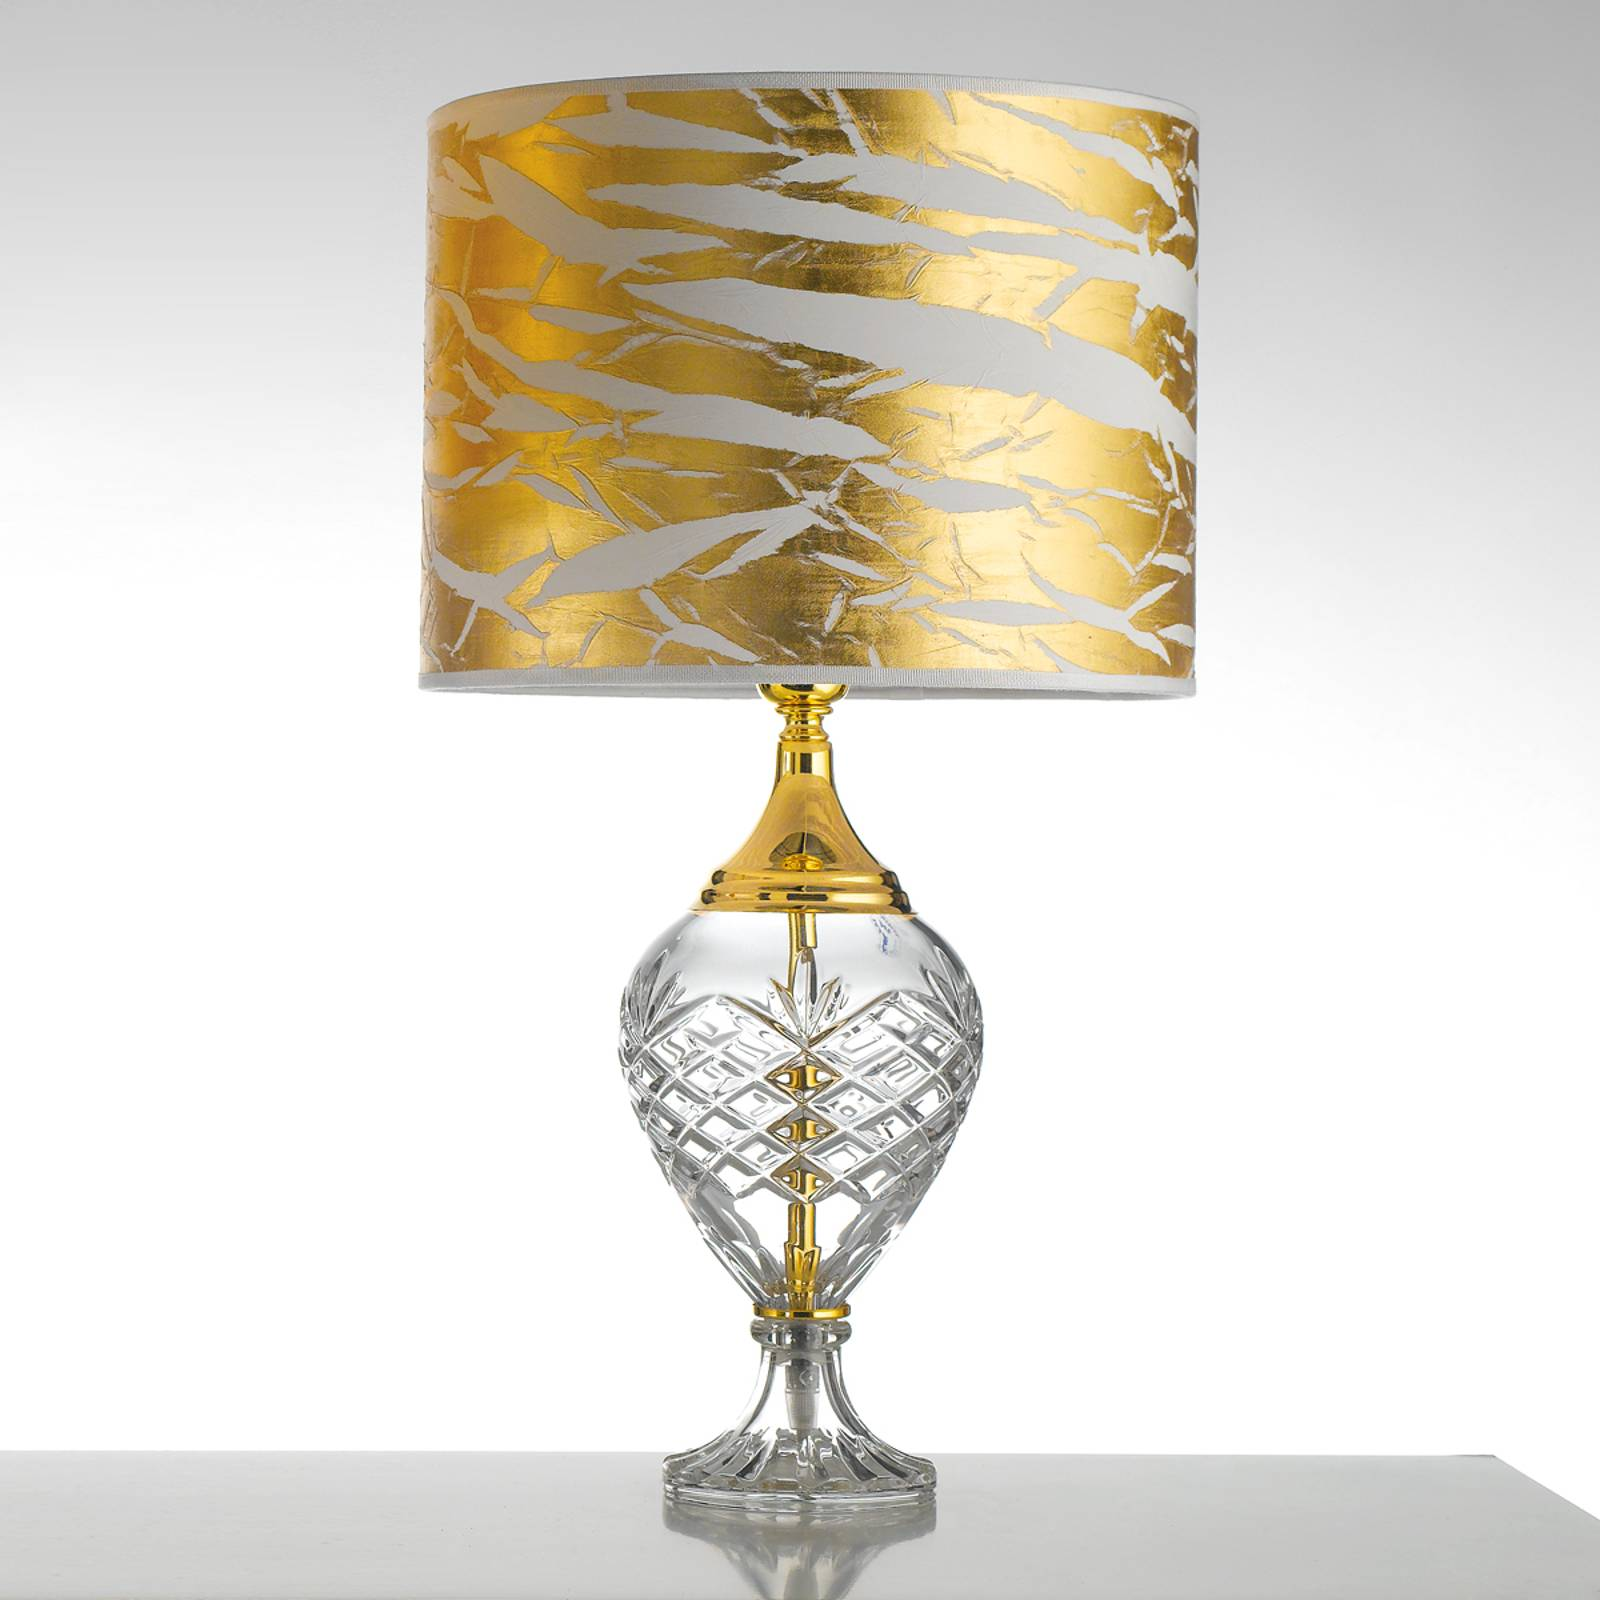 Kullanvärinen pöytälamppu Belle Epoque, lasijalka